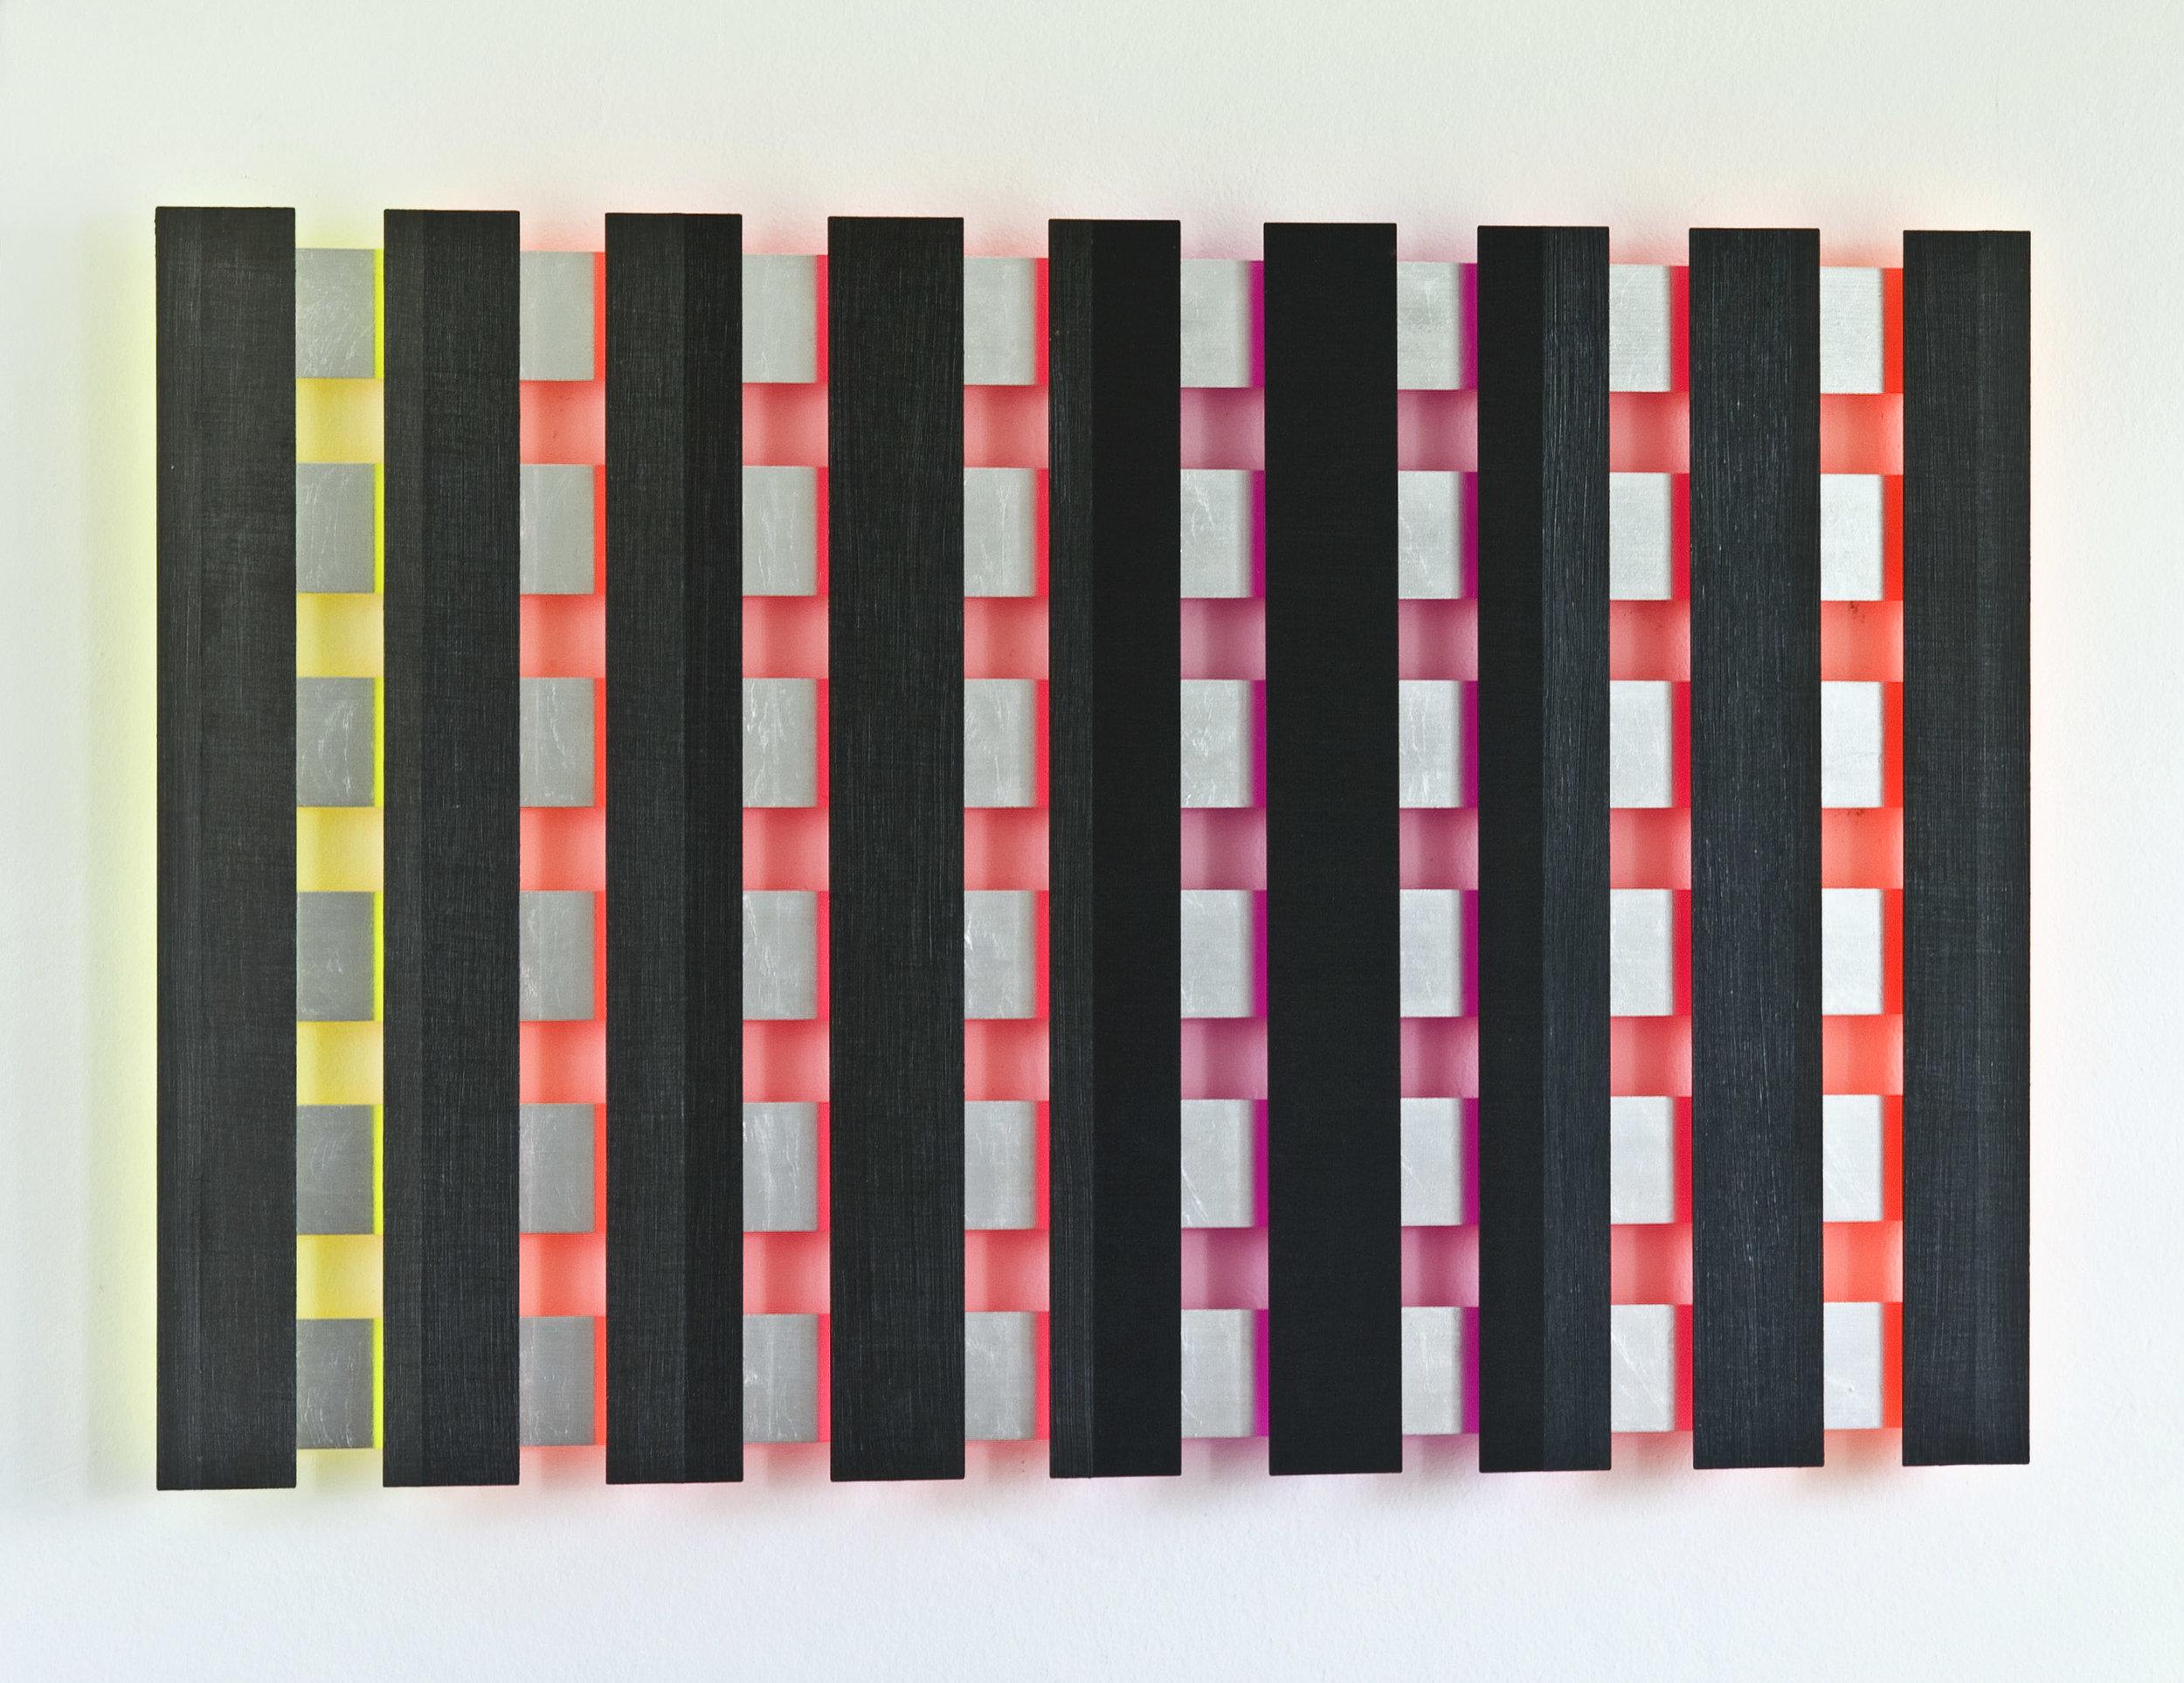 1t akril, les, 79 x 125 cm, 2009.jpg